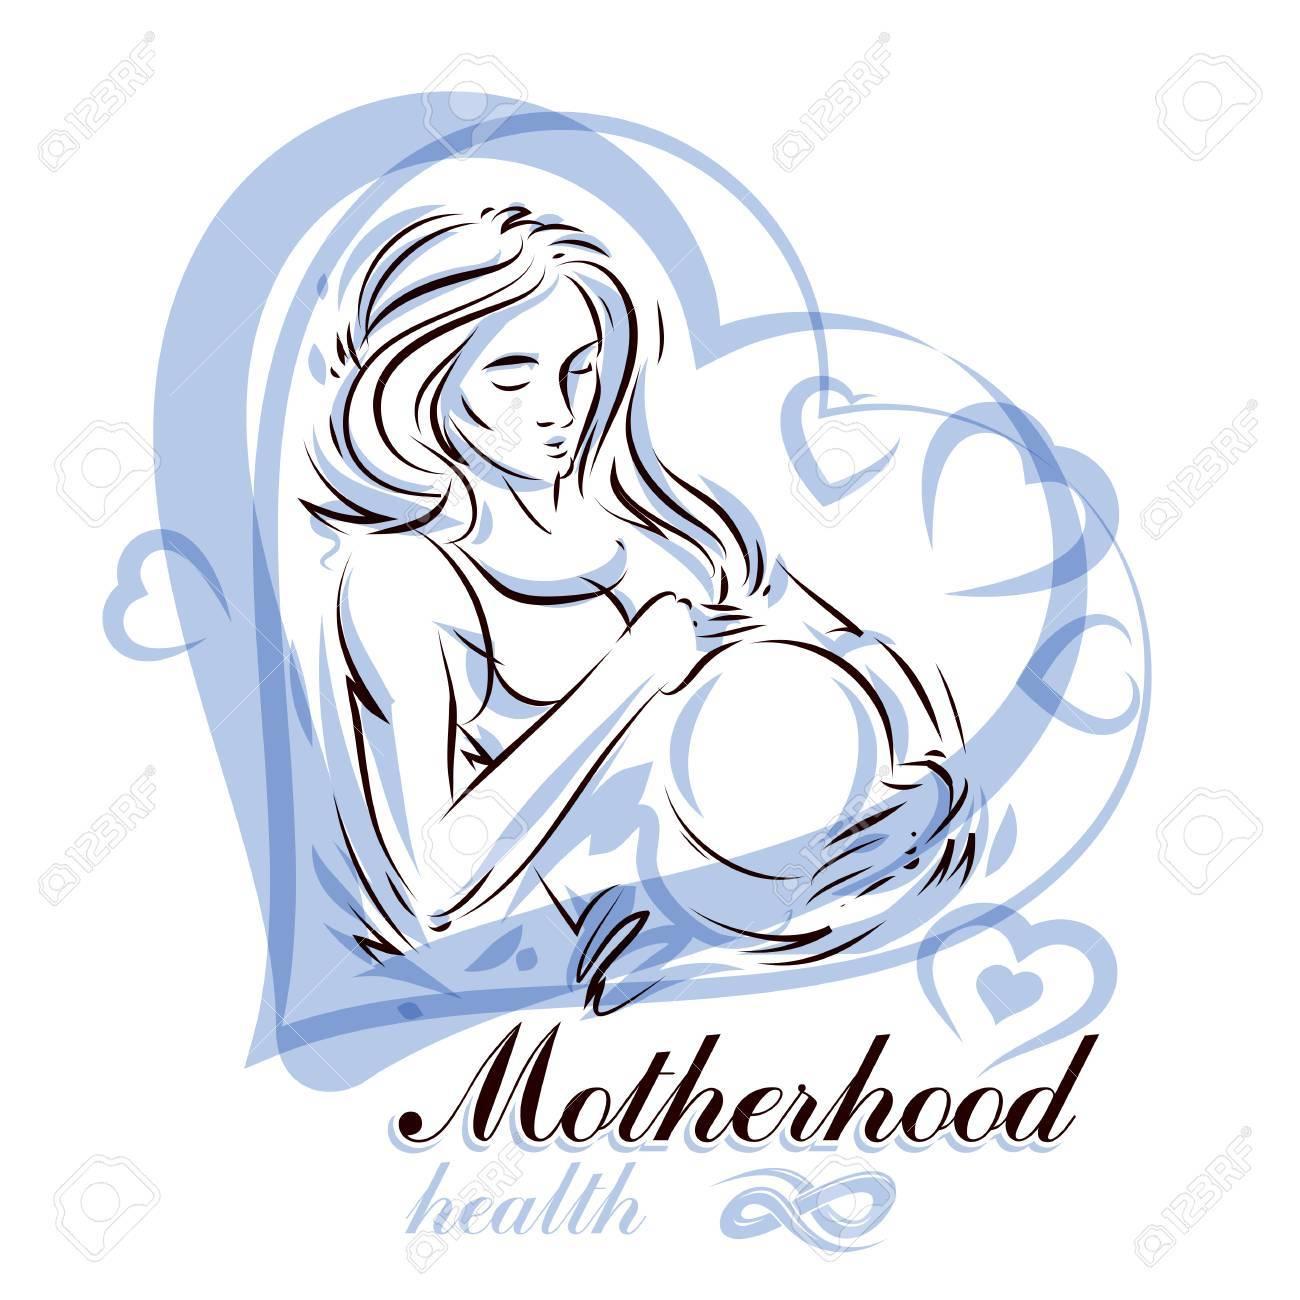 1300x1300 Elegant Pregnant Woman Body Silhouette Drawing. Vector